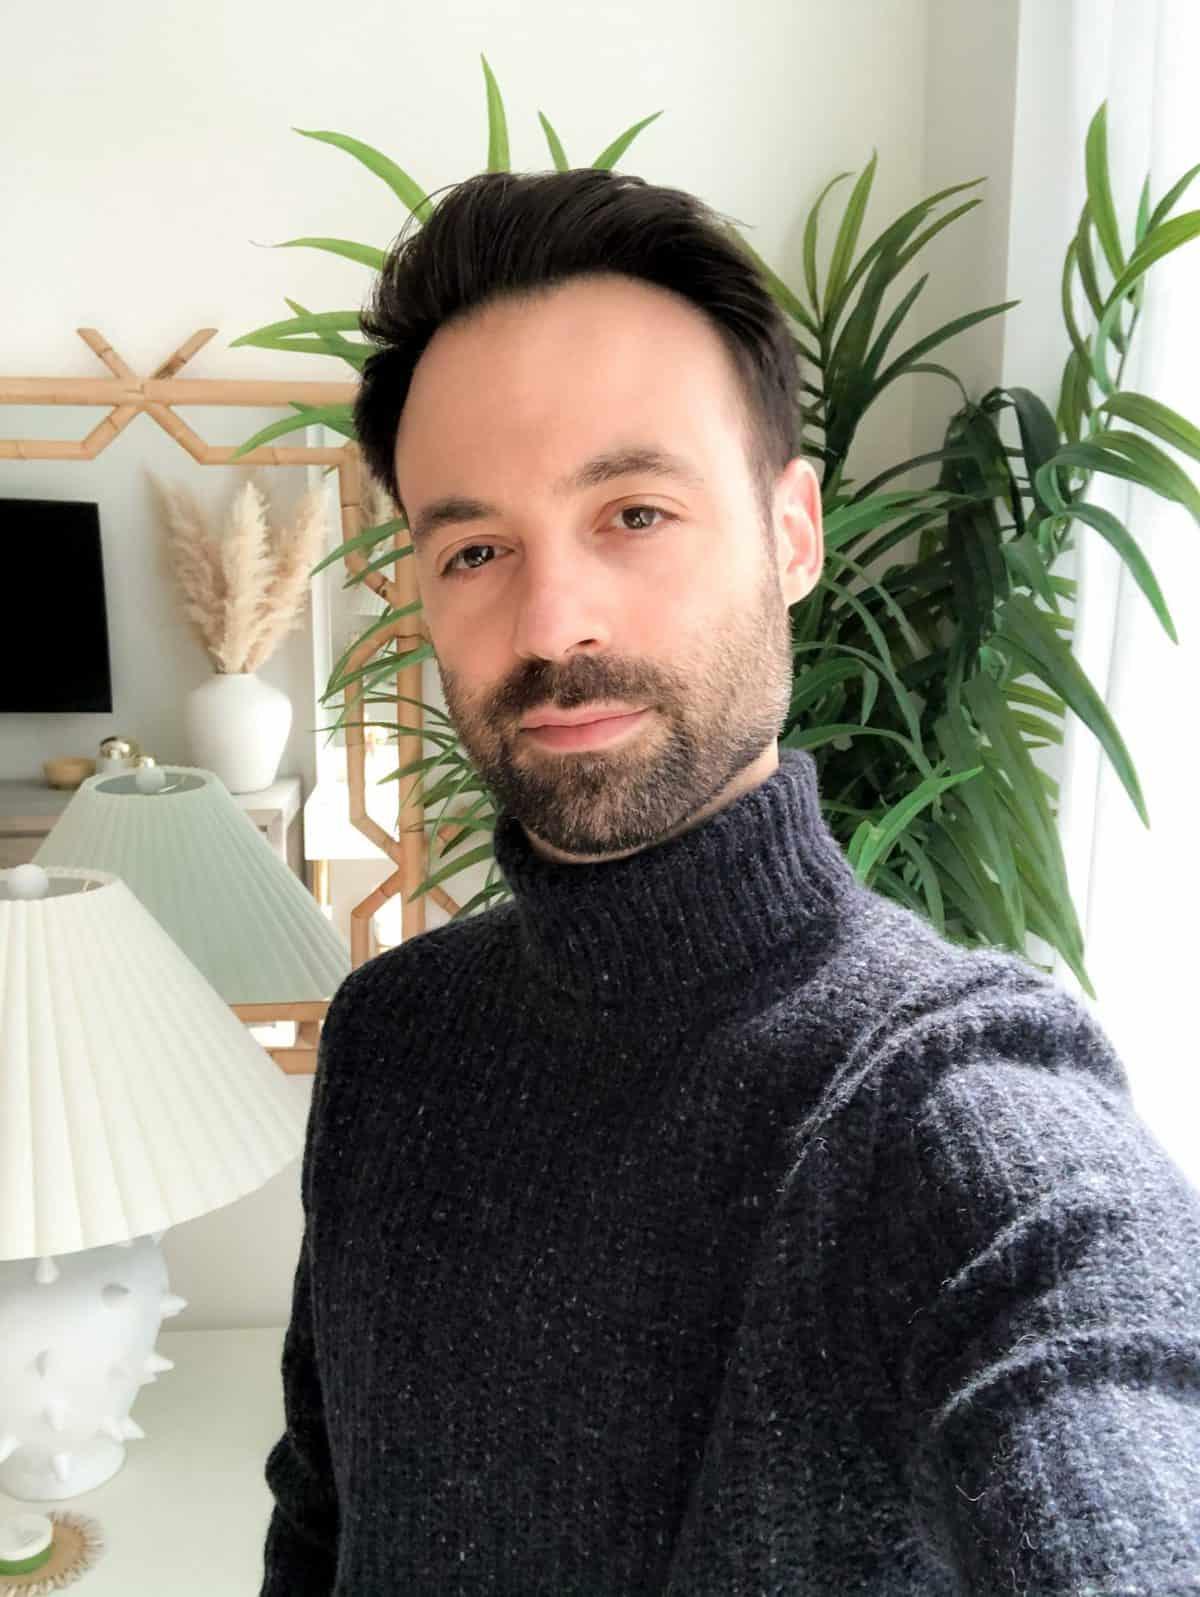 Naadam Marled Cashmere Turtleneck Sweater